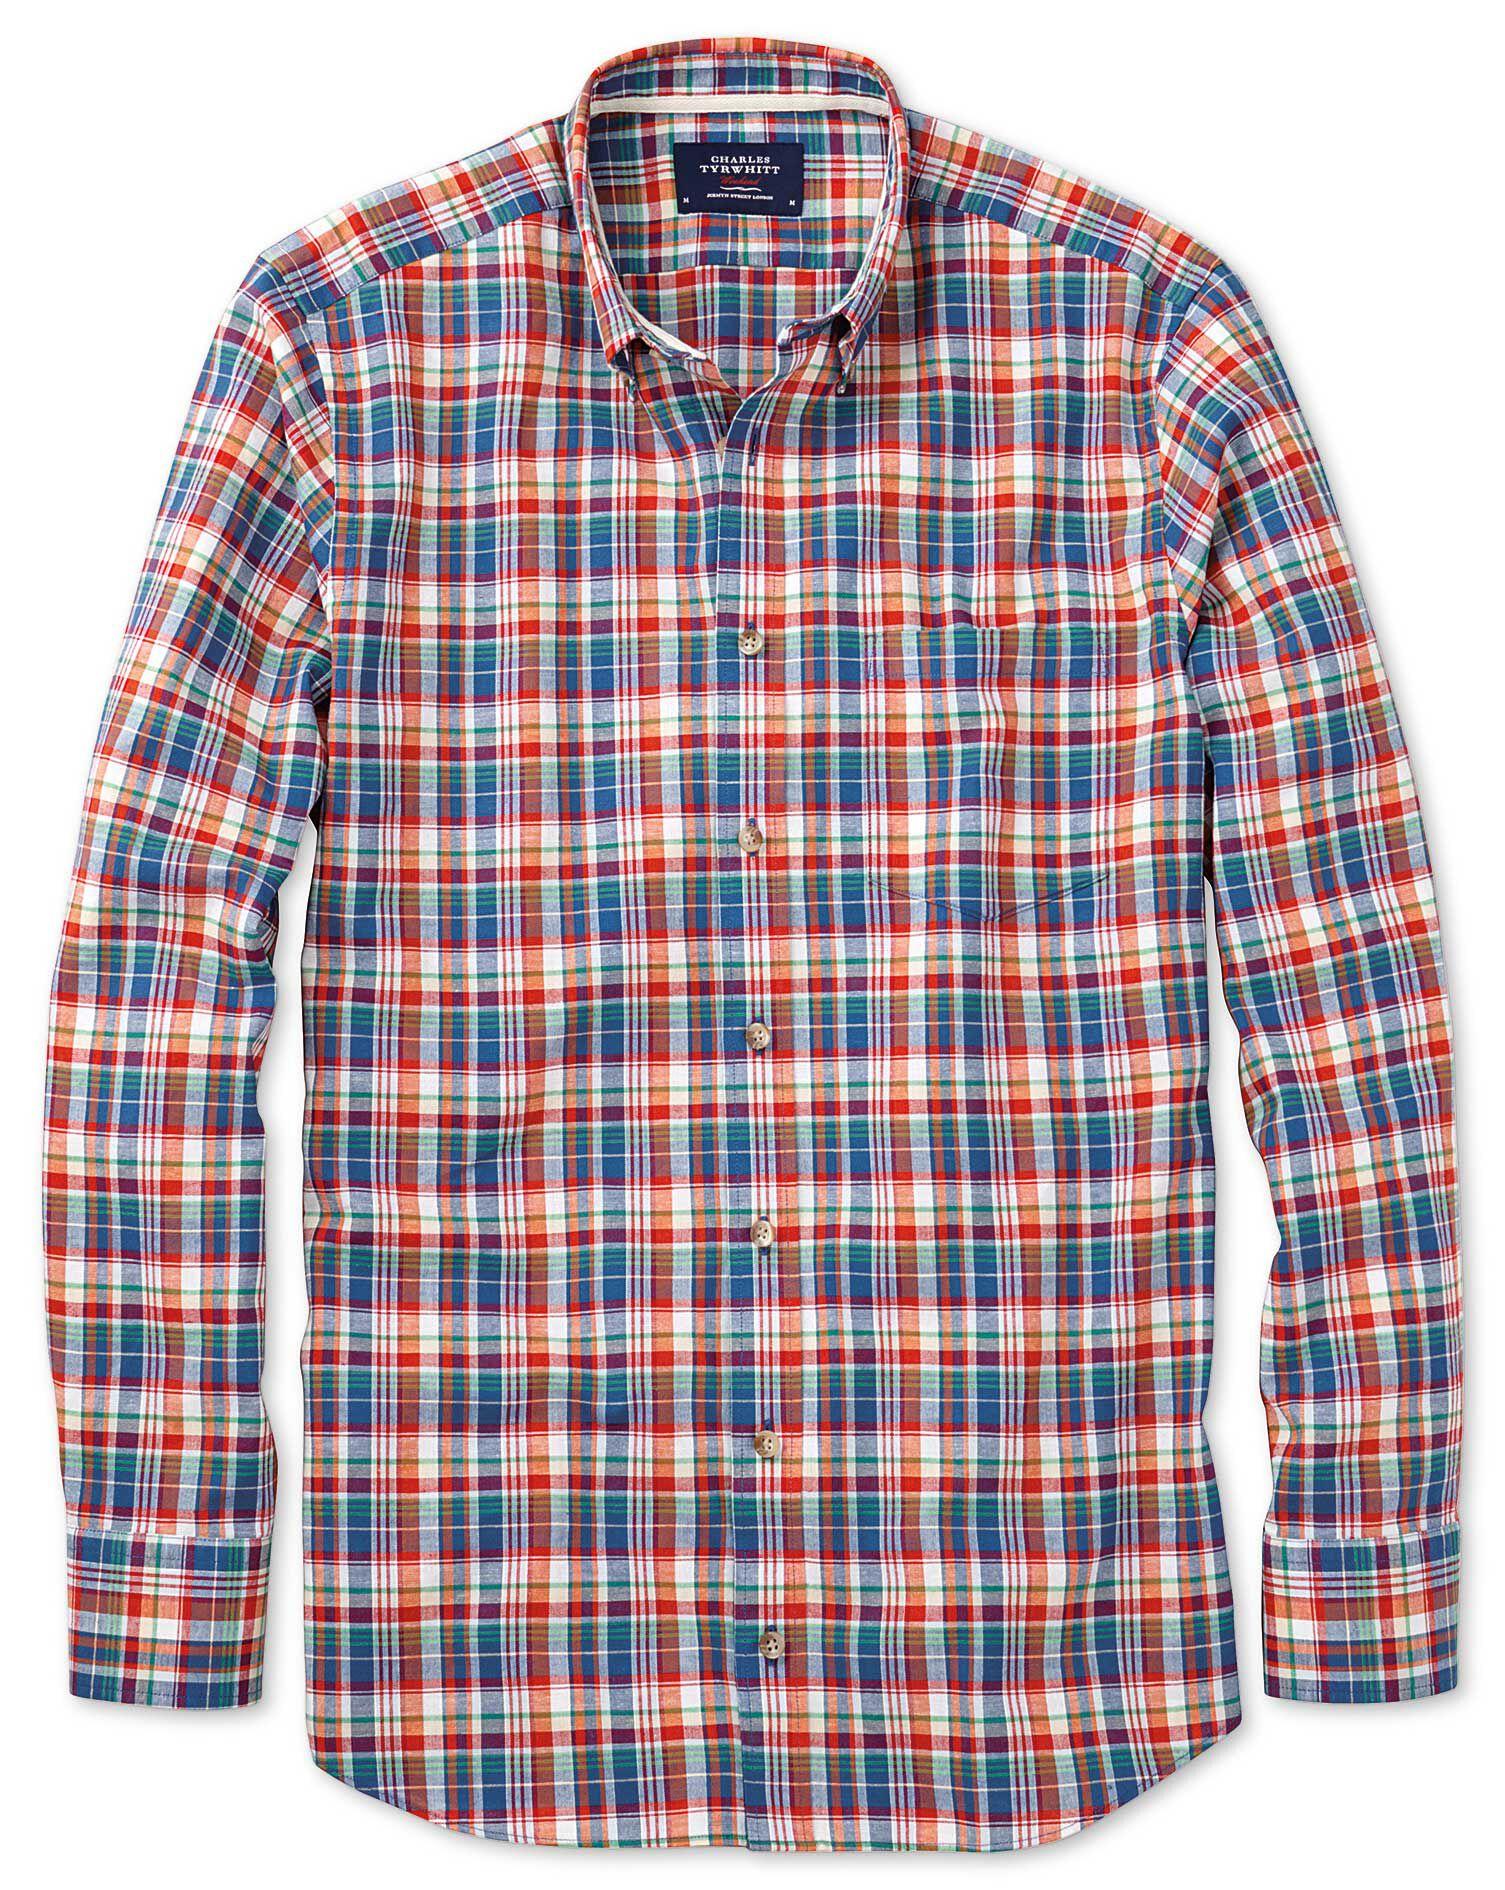 Slim Fit Orange and Blue Check Cotton Shirt Single Cuff Size XS by Charles Tyrwhitt